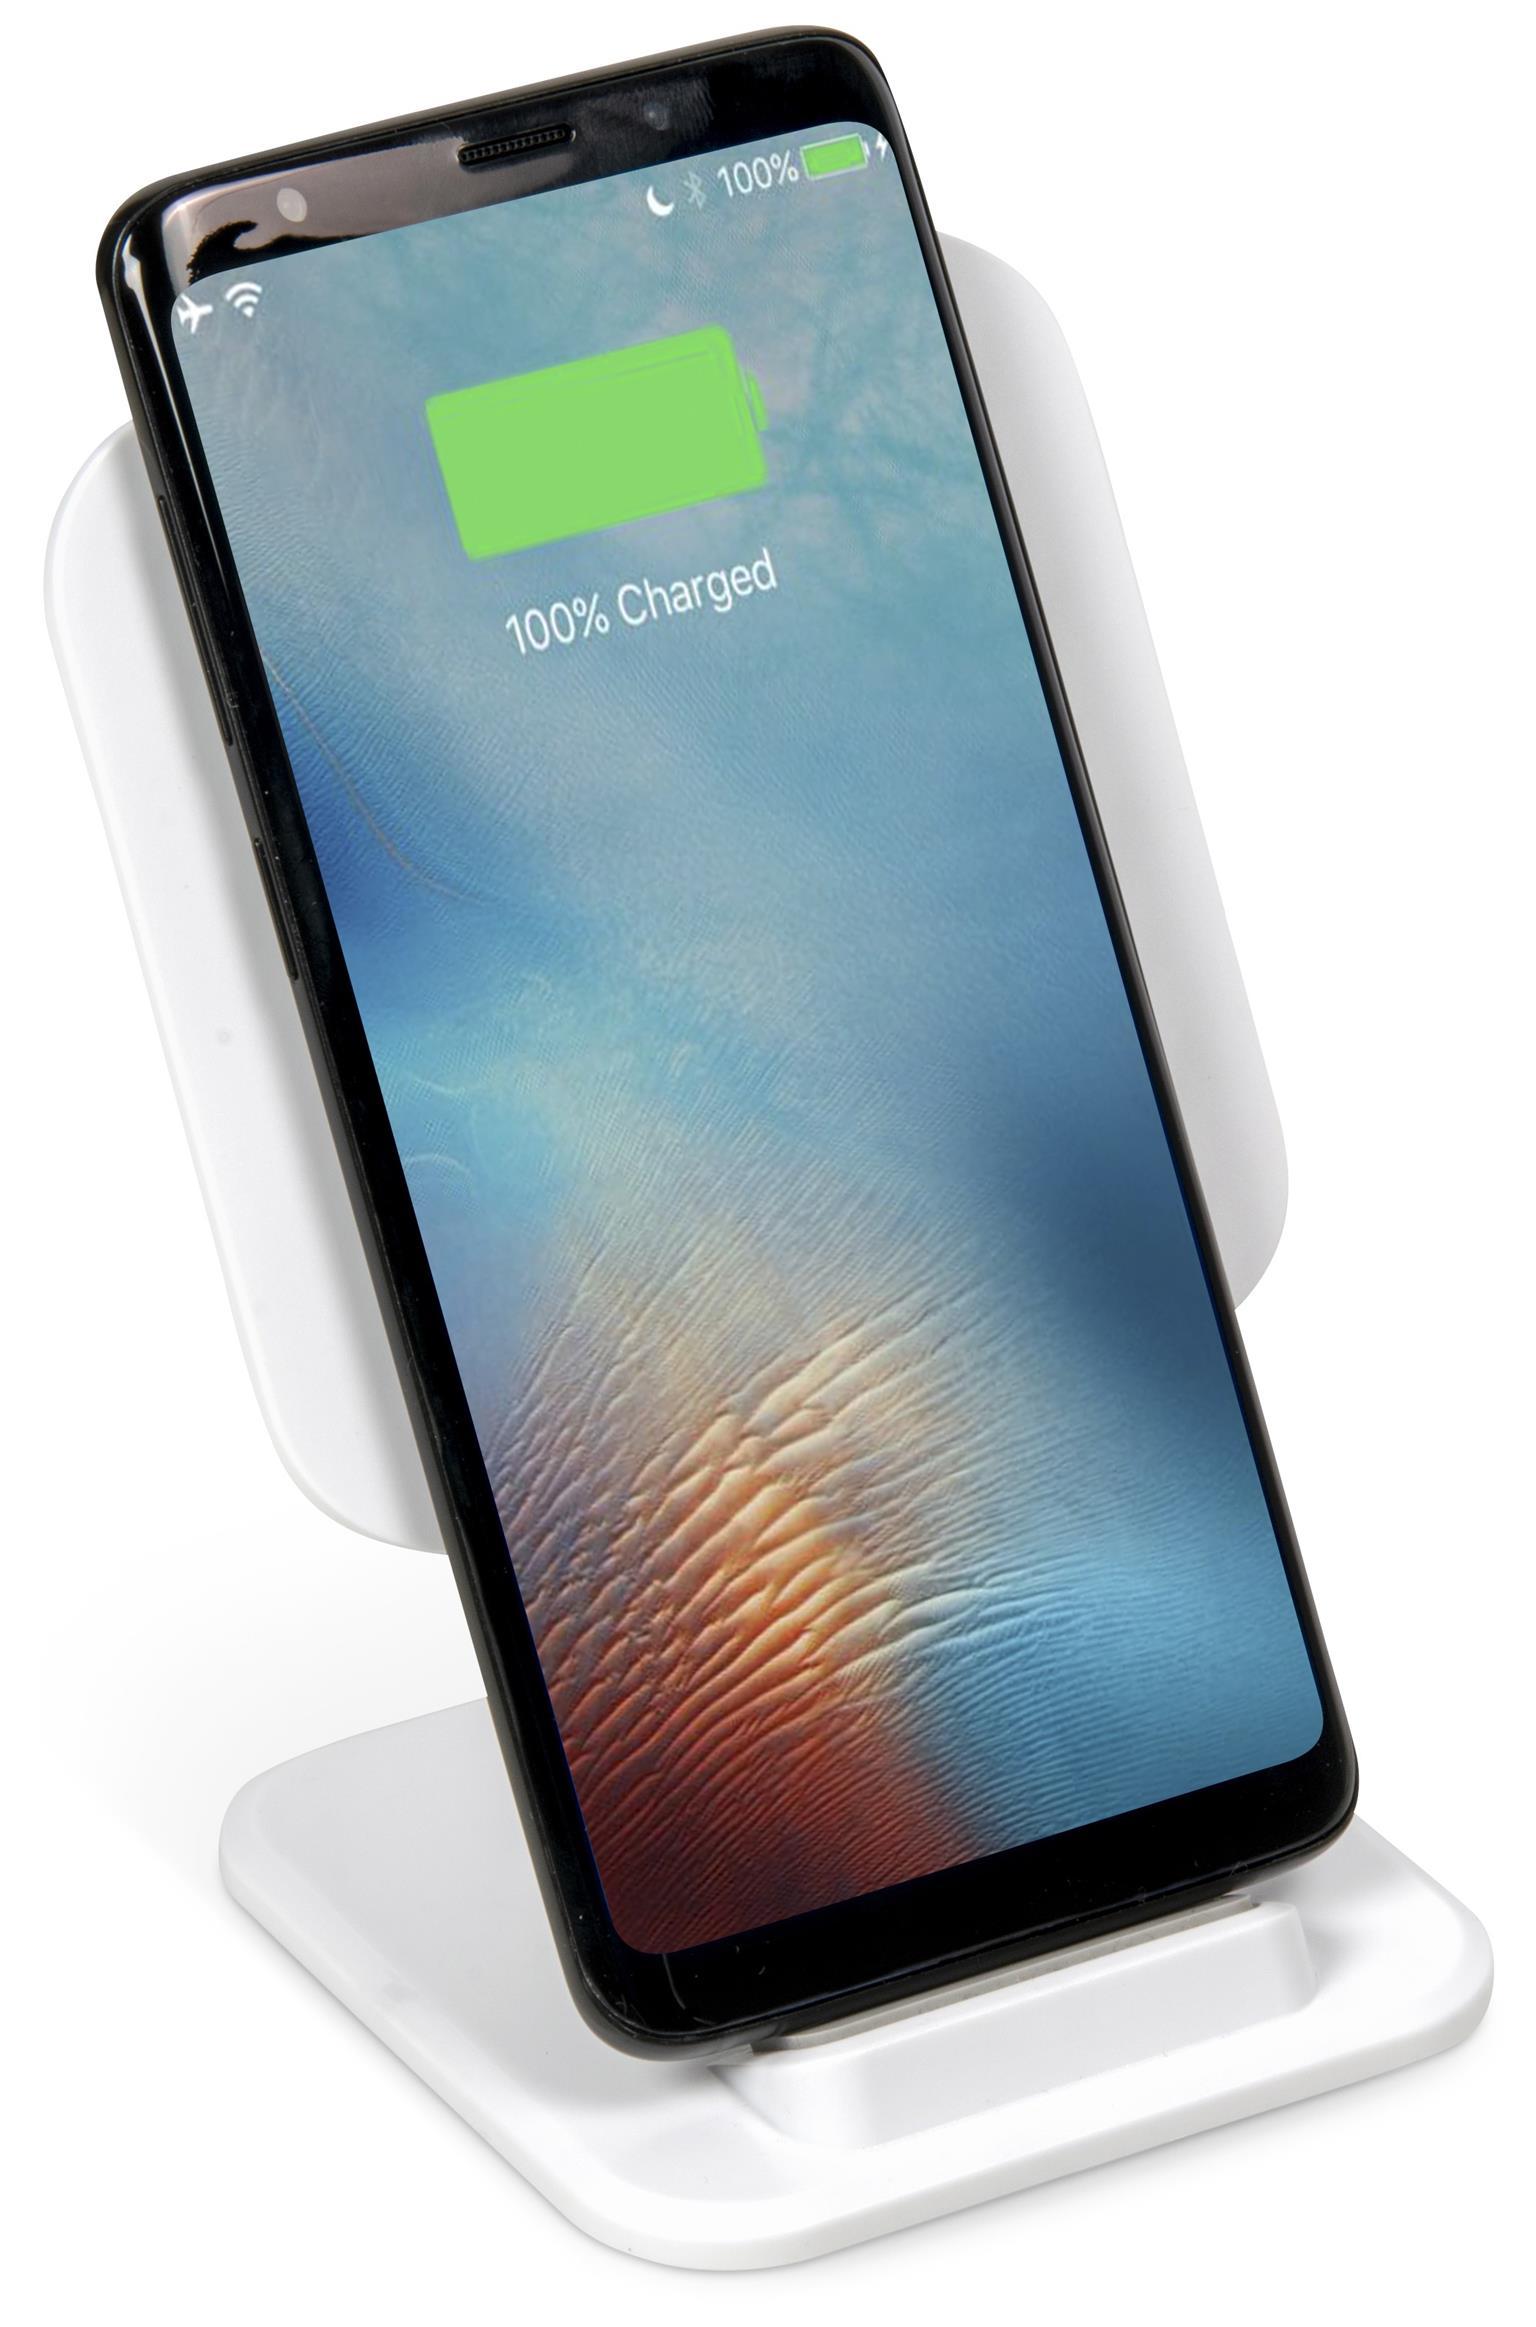 Nimbus Wireless Charger & Phone Holder